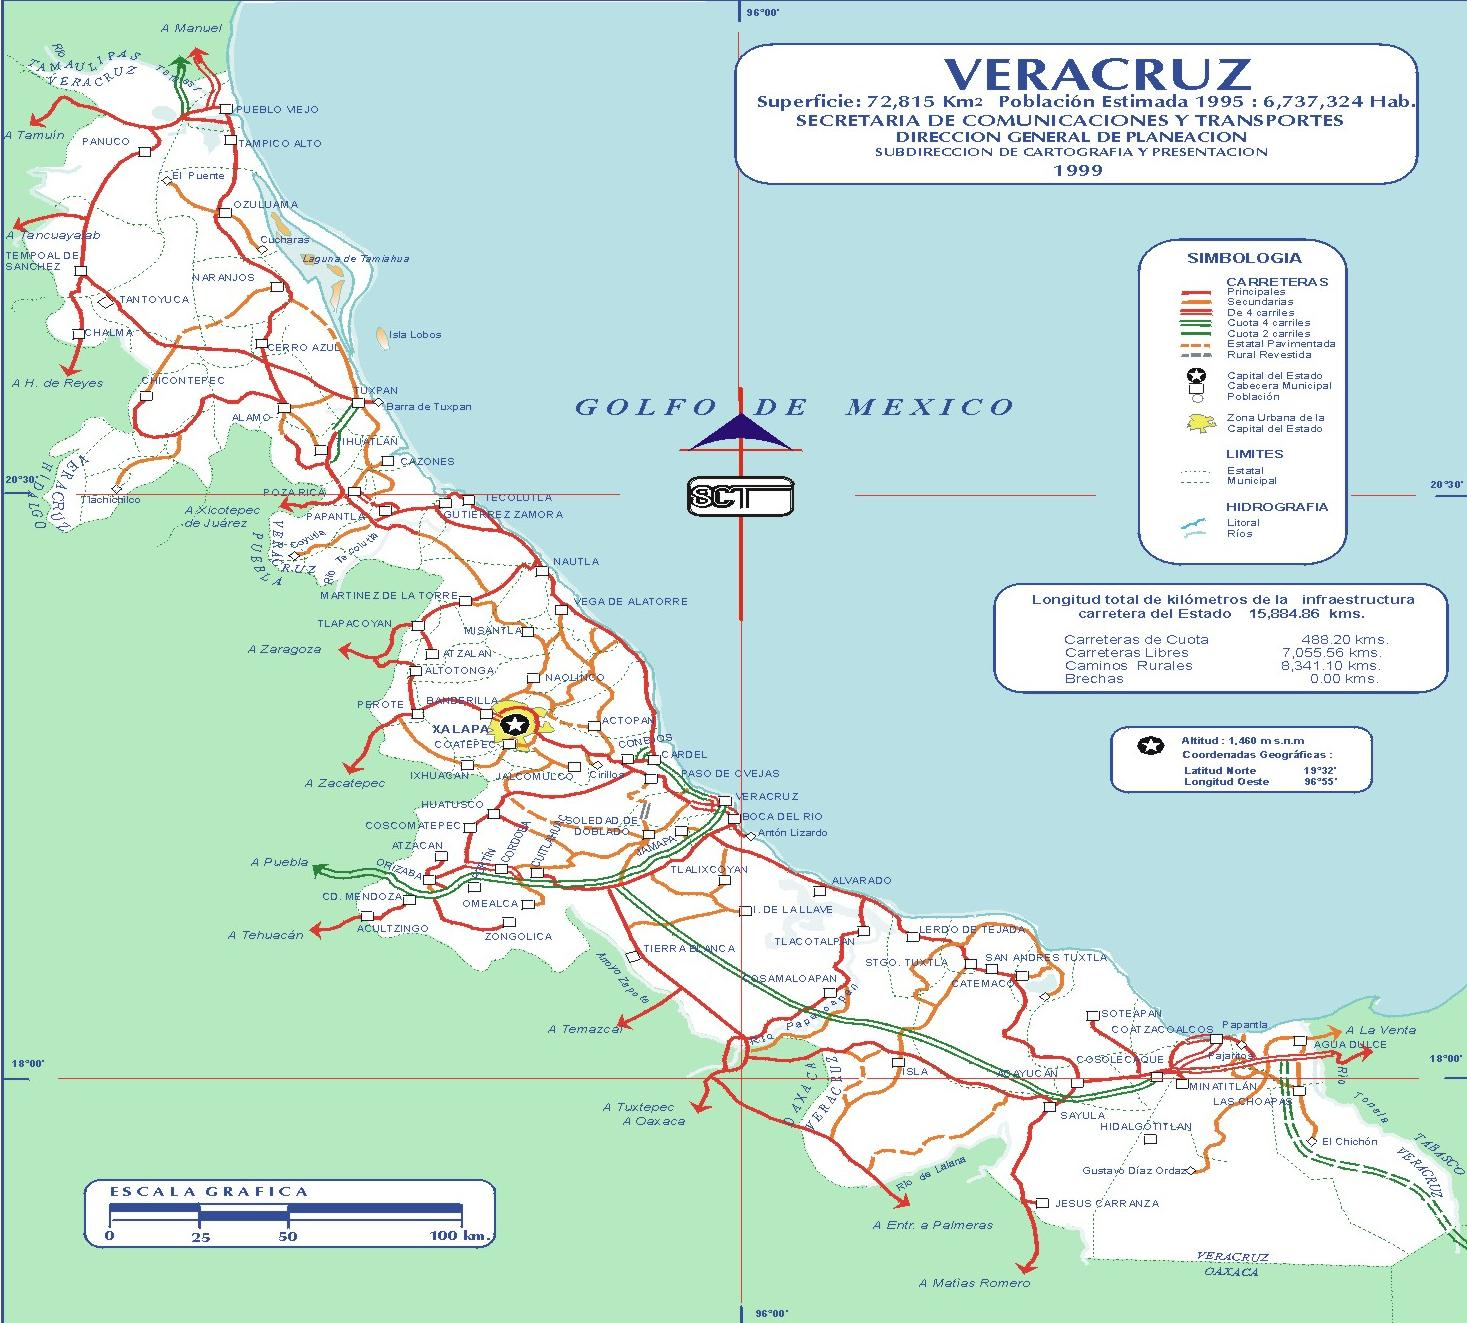 Mapa de Veracruz 1999 - Tamaño completo